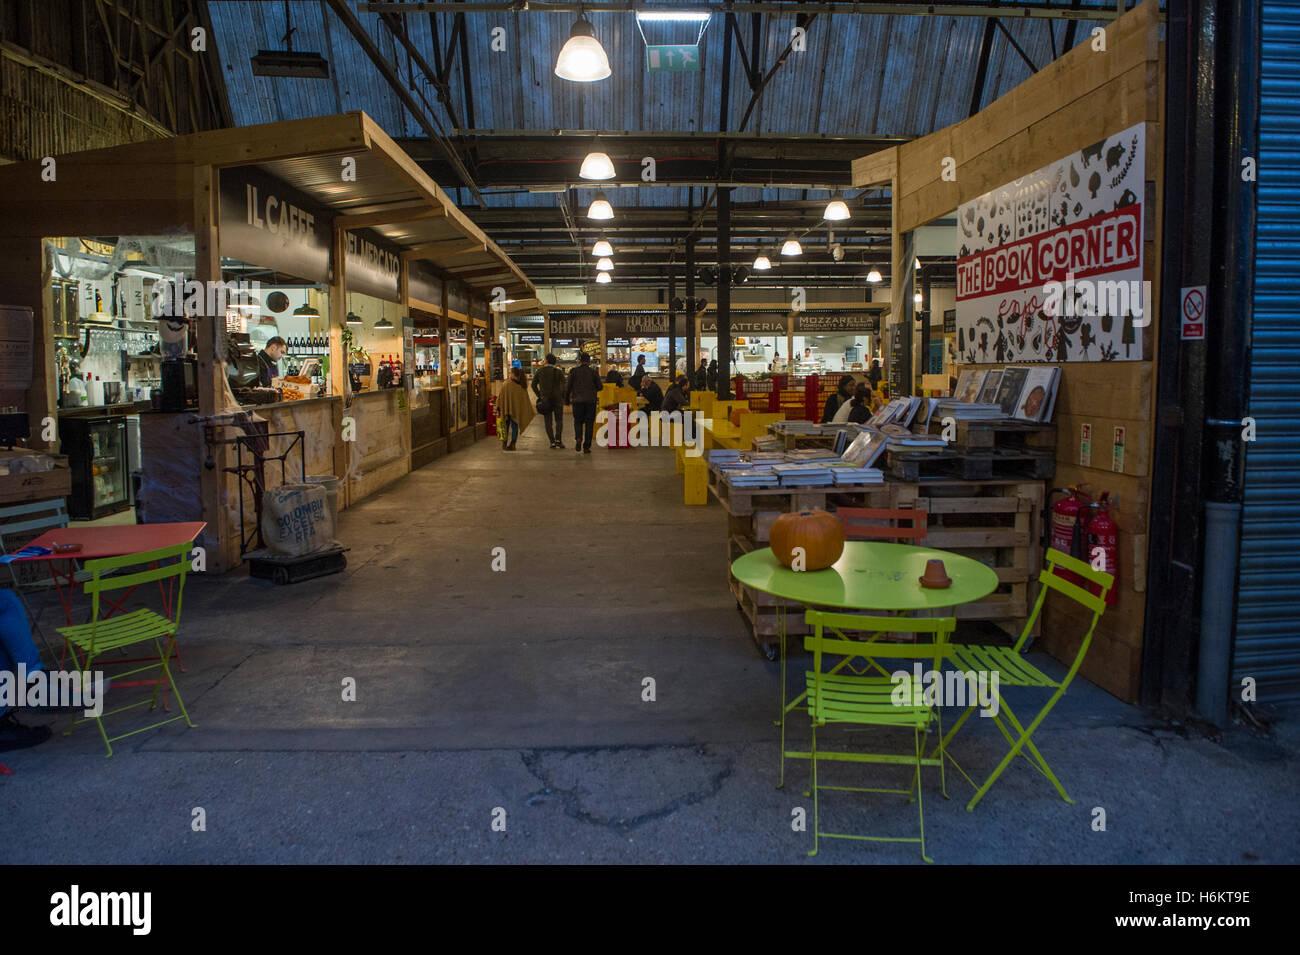 Pop up bars and restaurants in Mercato Metropolitano 42 Newington Causeway, London SE1 - Stock Image